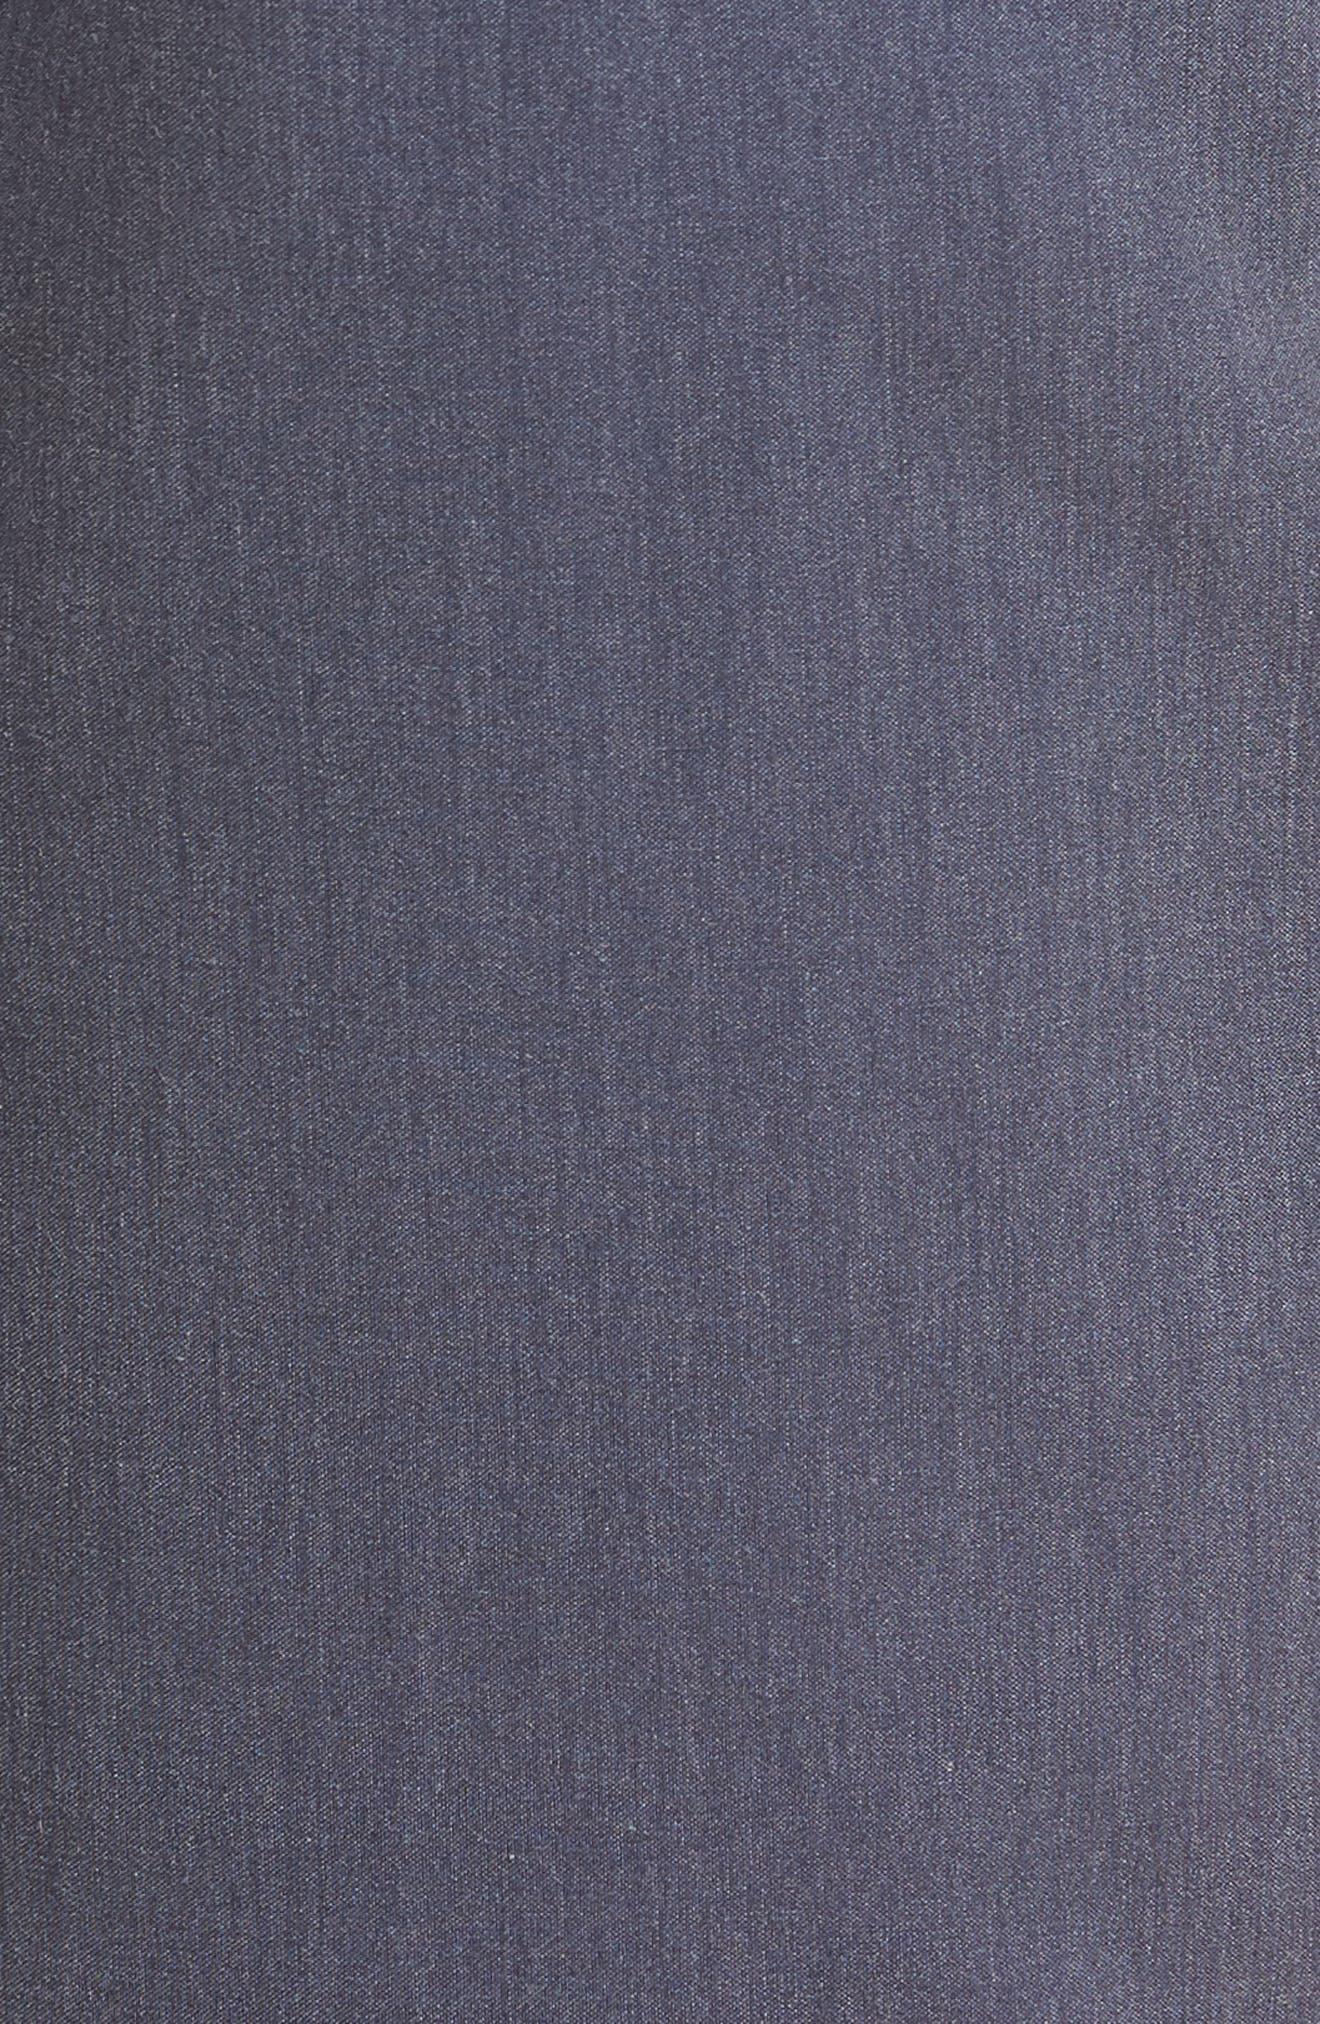 Mirage Owen Stretch Board Shorts,                             Alternate thumbnail 5, color,                             600